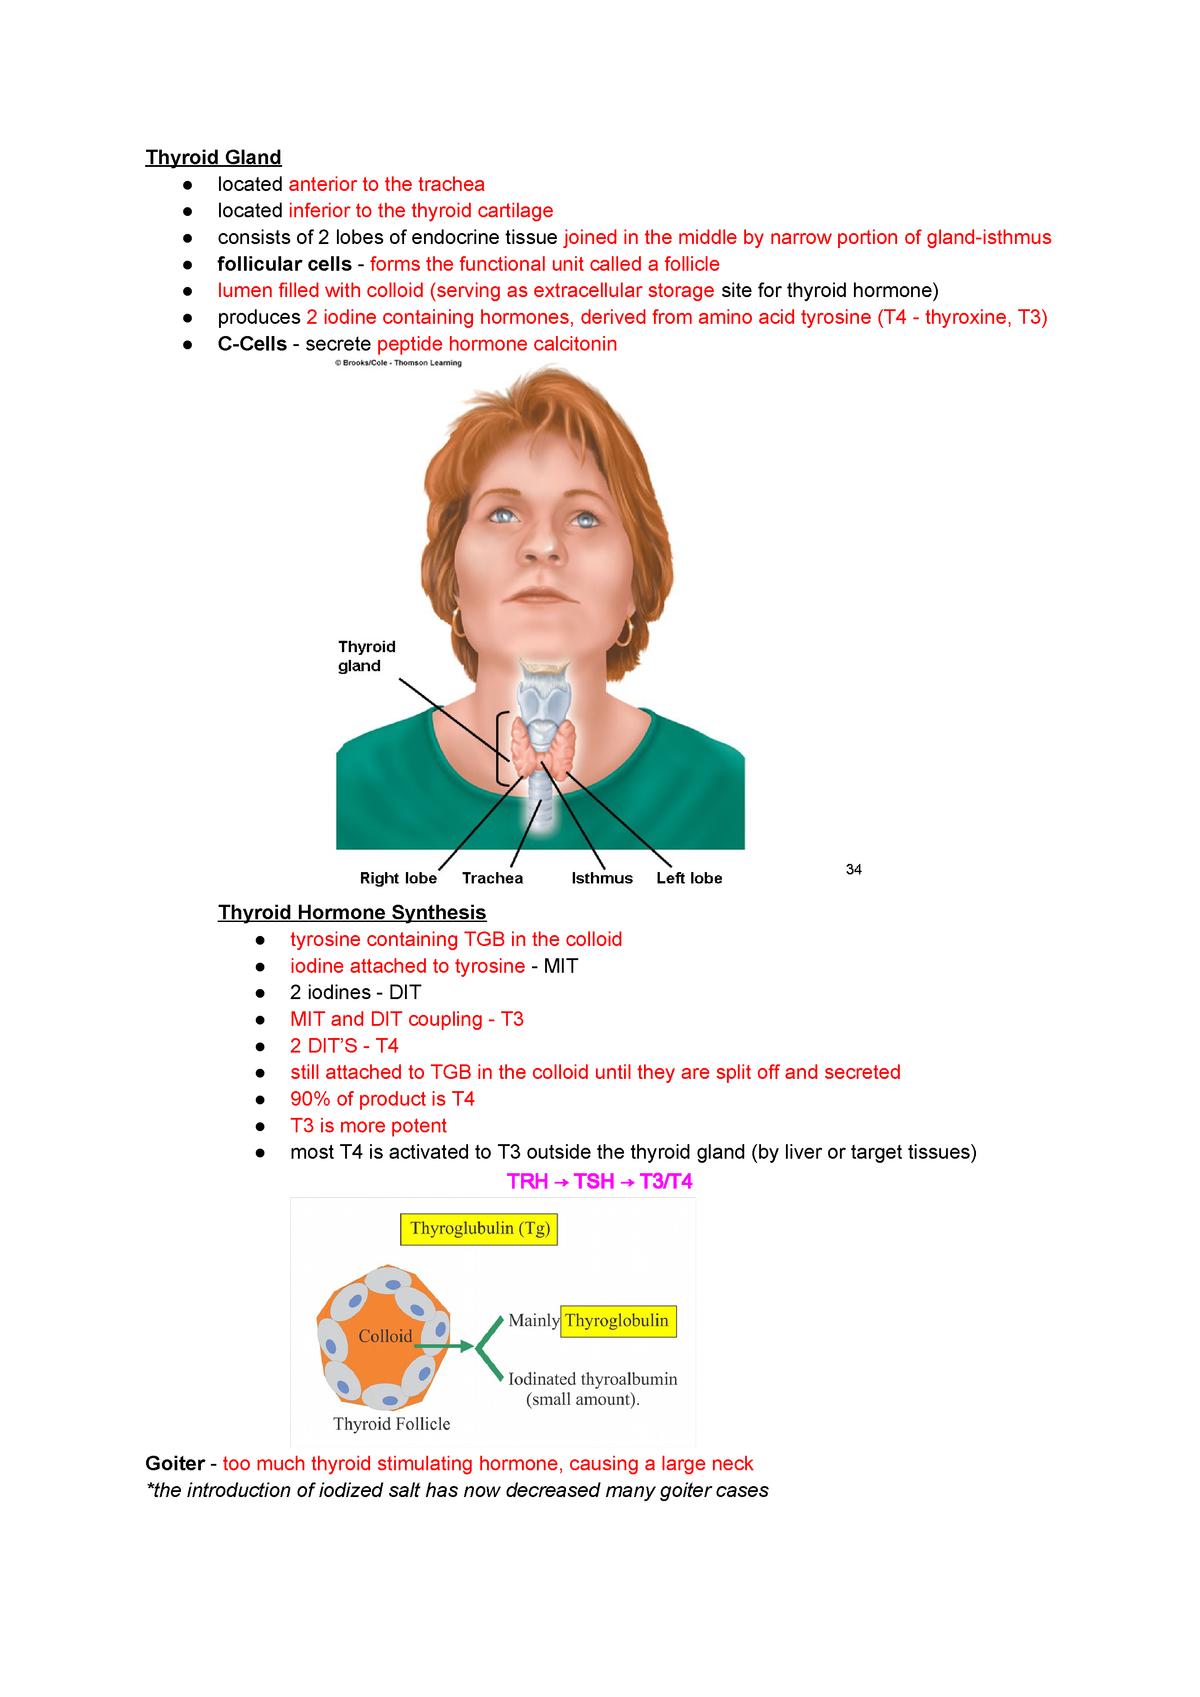 23 - Peripheral Endocrine Glands - Nurs111 Anatomy - StuDocu